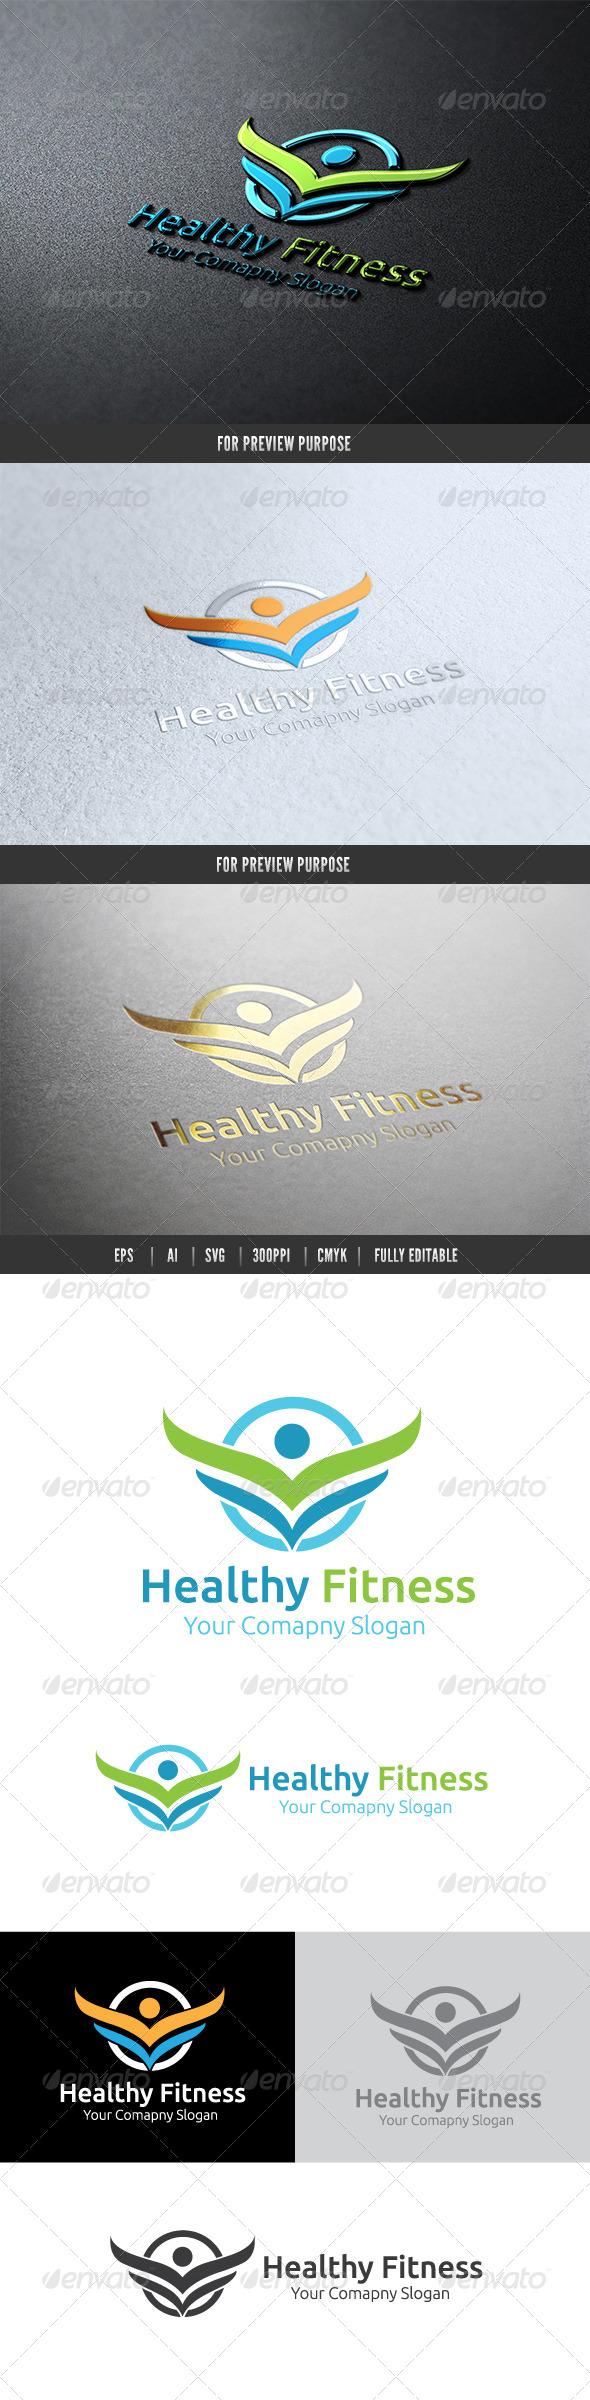 GraphicRiver Heathy Fitness 6482095